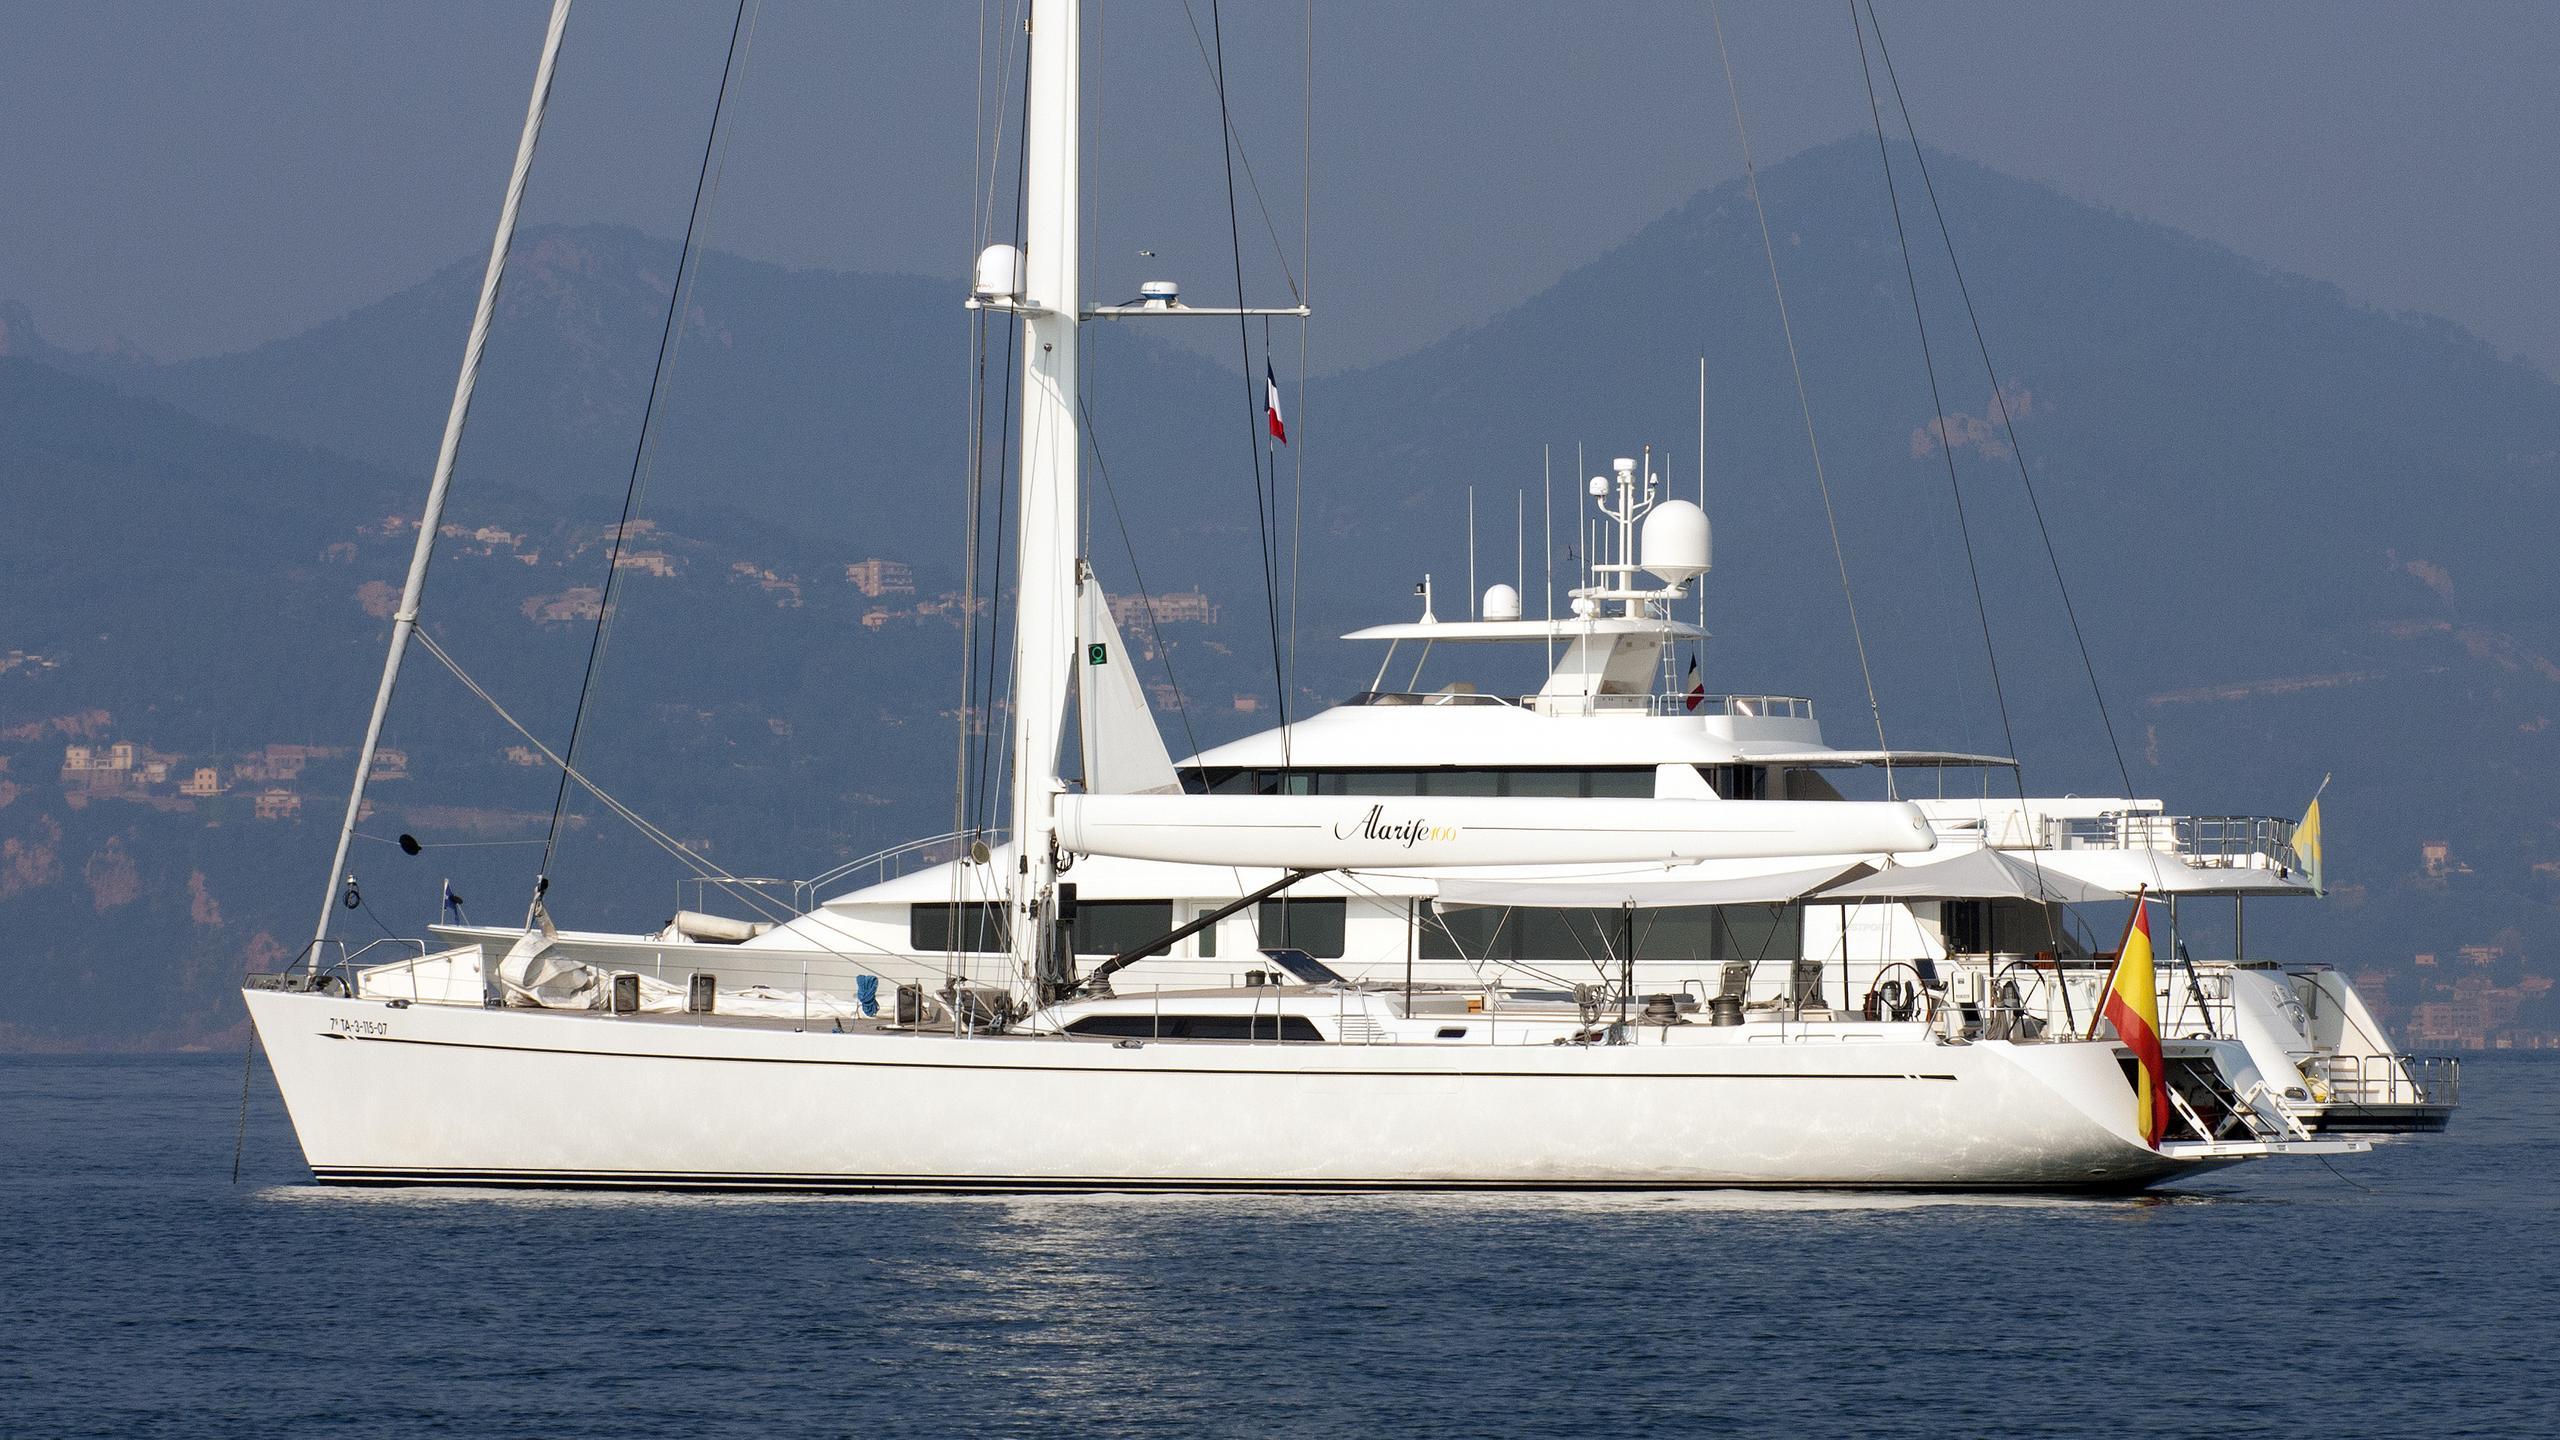 alarife-sailing-yacht-barcos-deportivos-2006-30m-profile